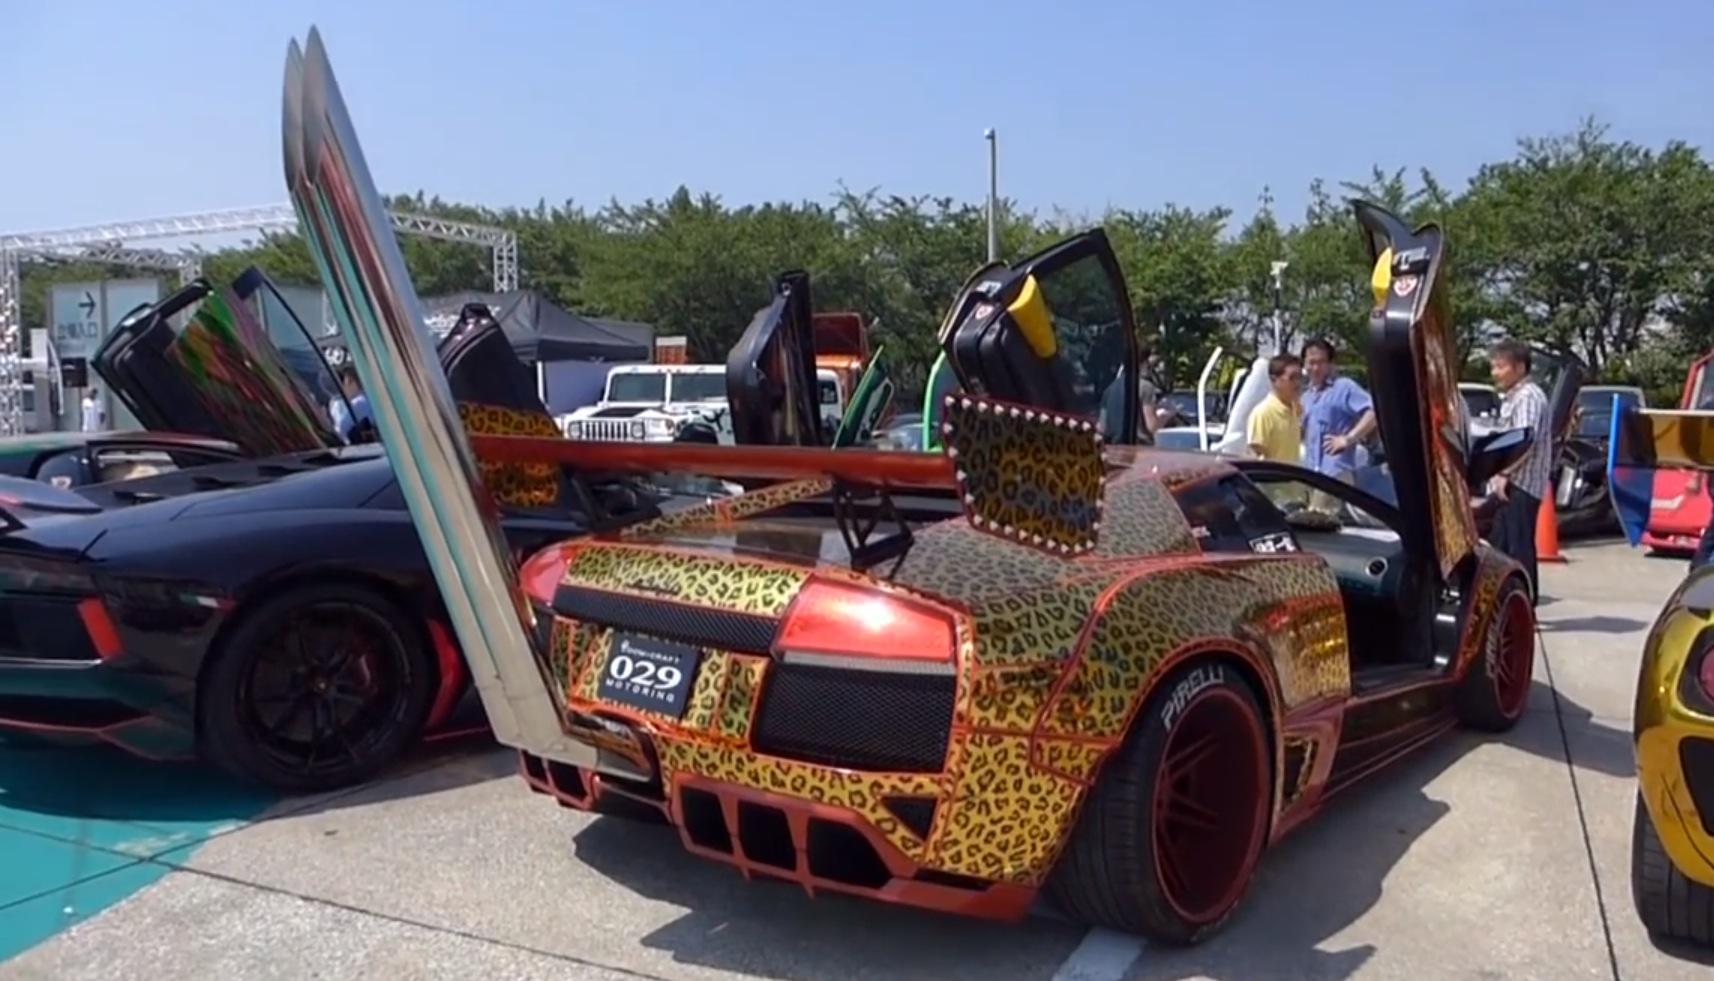 Bosozoku Lamborghini Has Leopard Wrap And Takeyari Bamboo